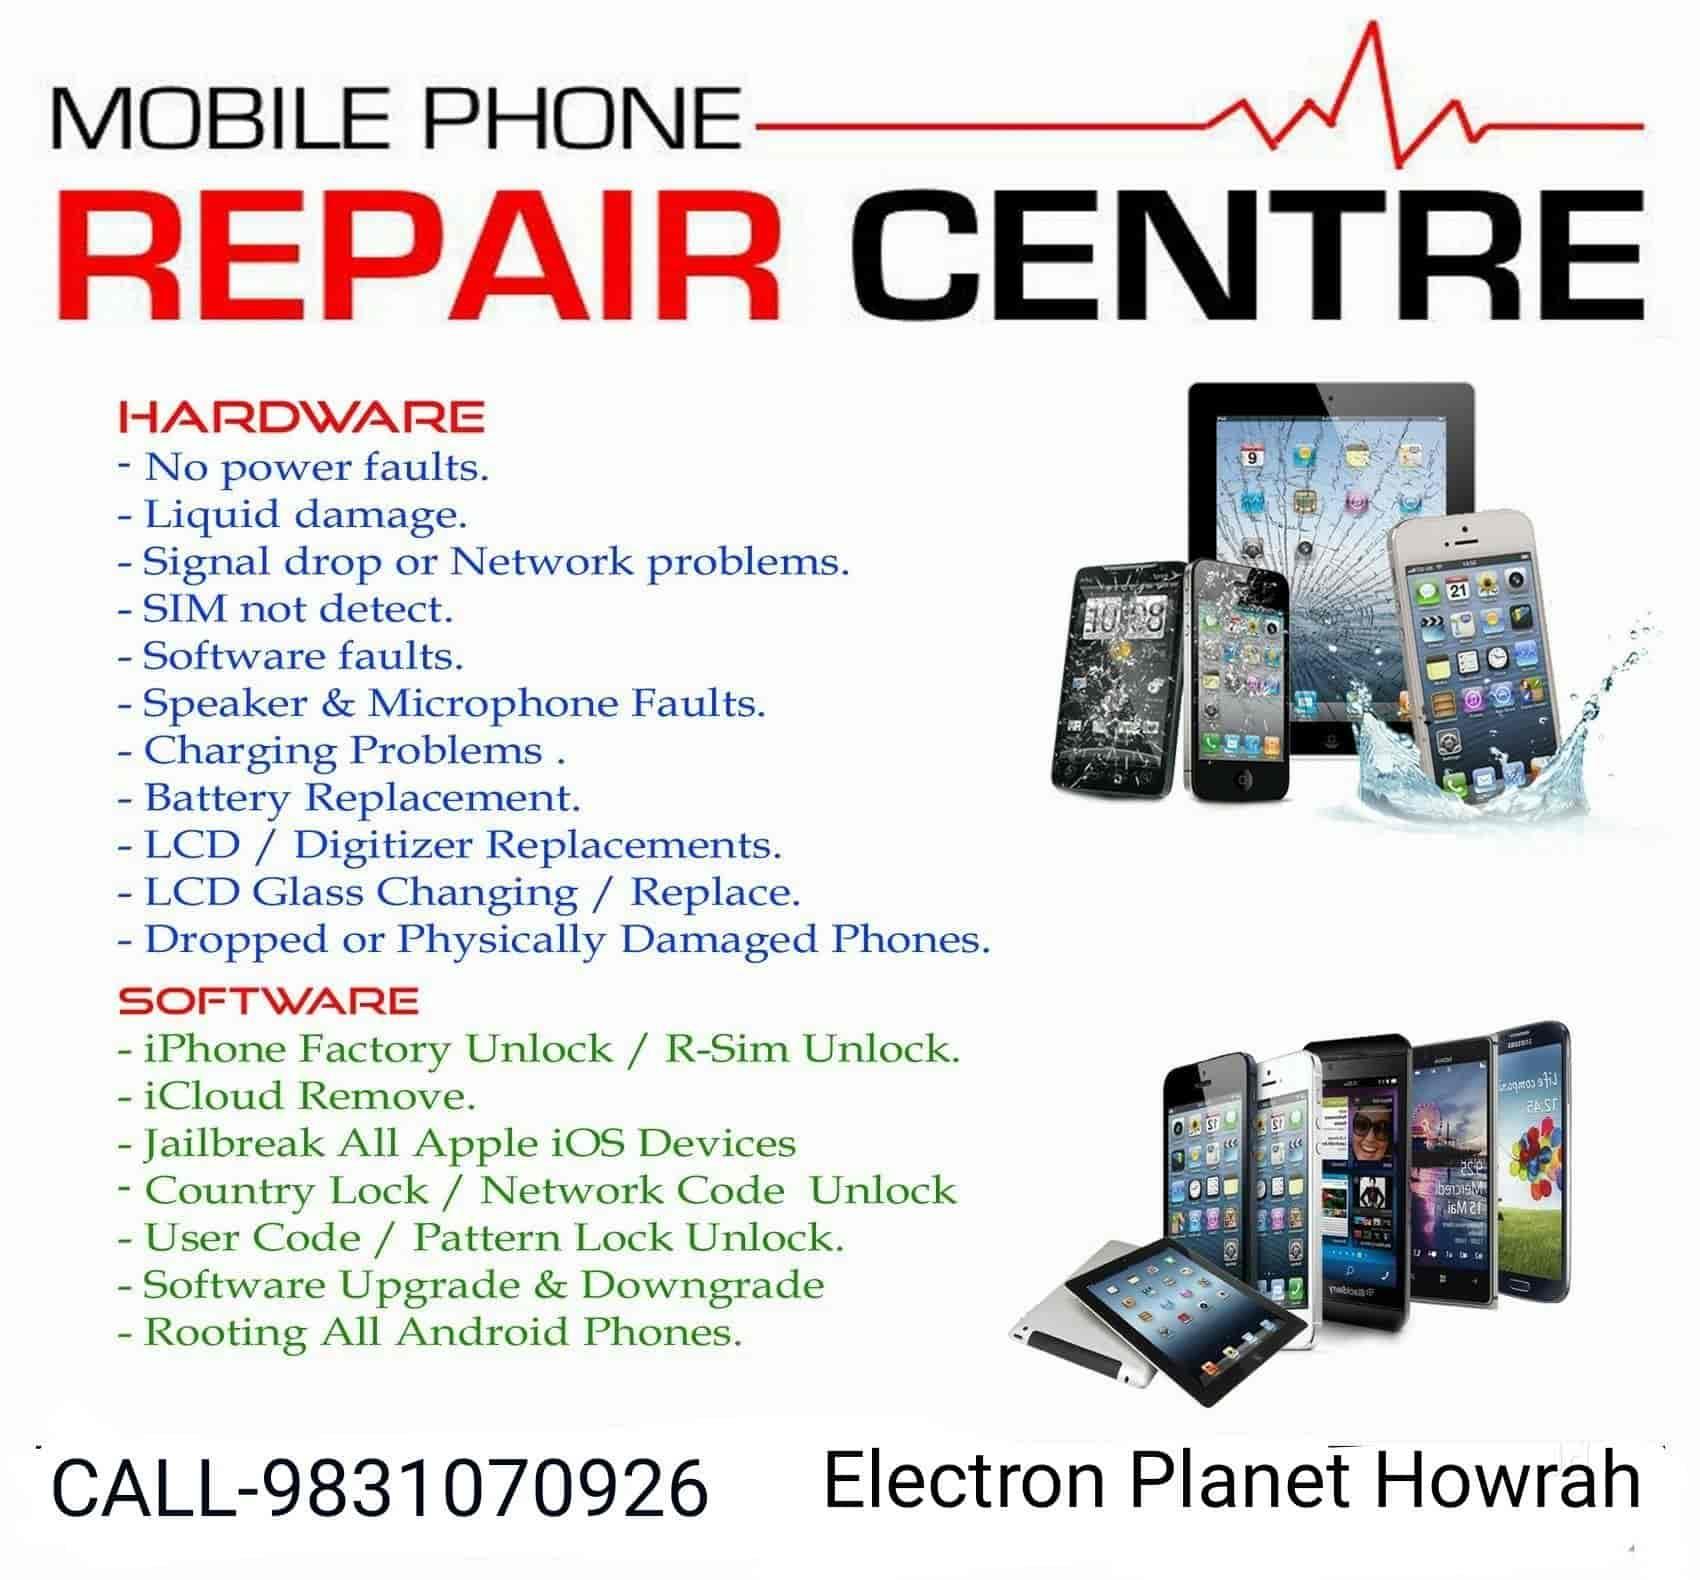 Electron Planet, Kadamtala - Mobile Phone Repair & Services